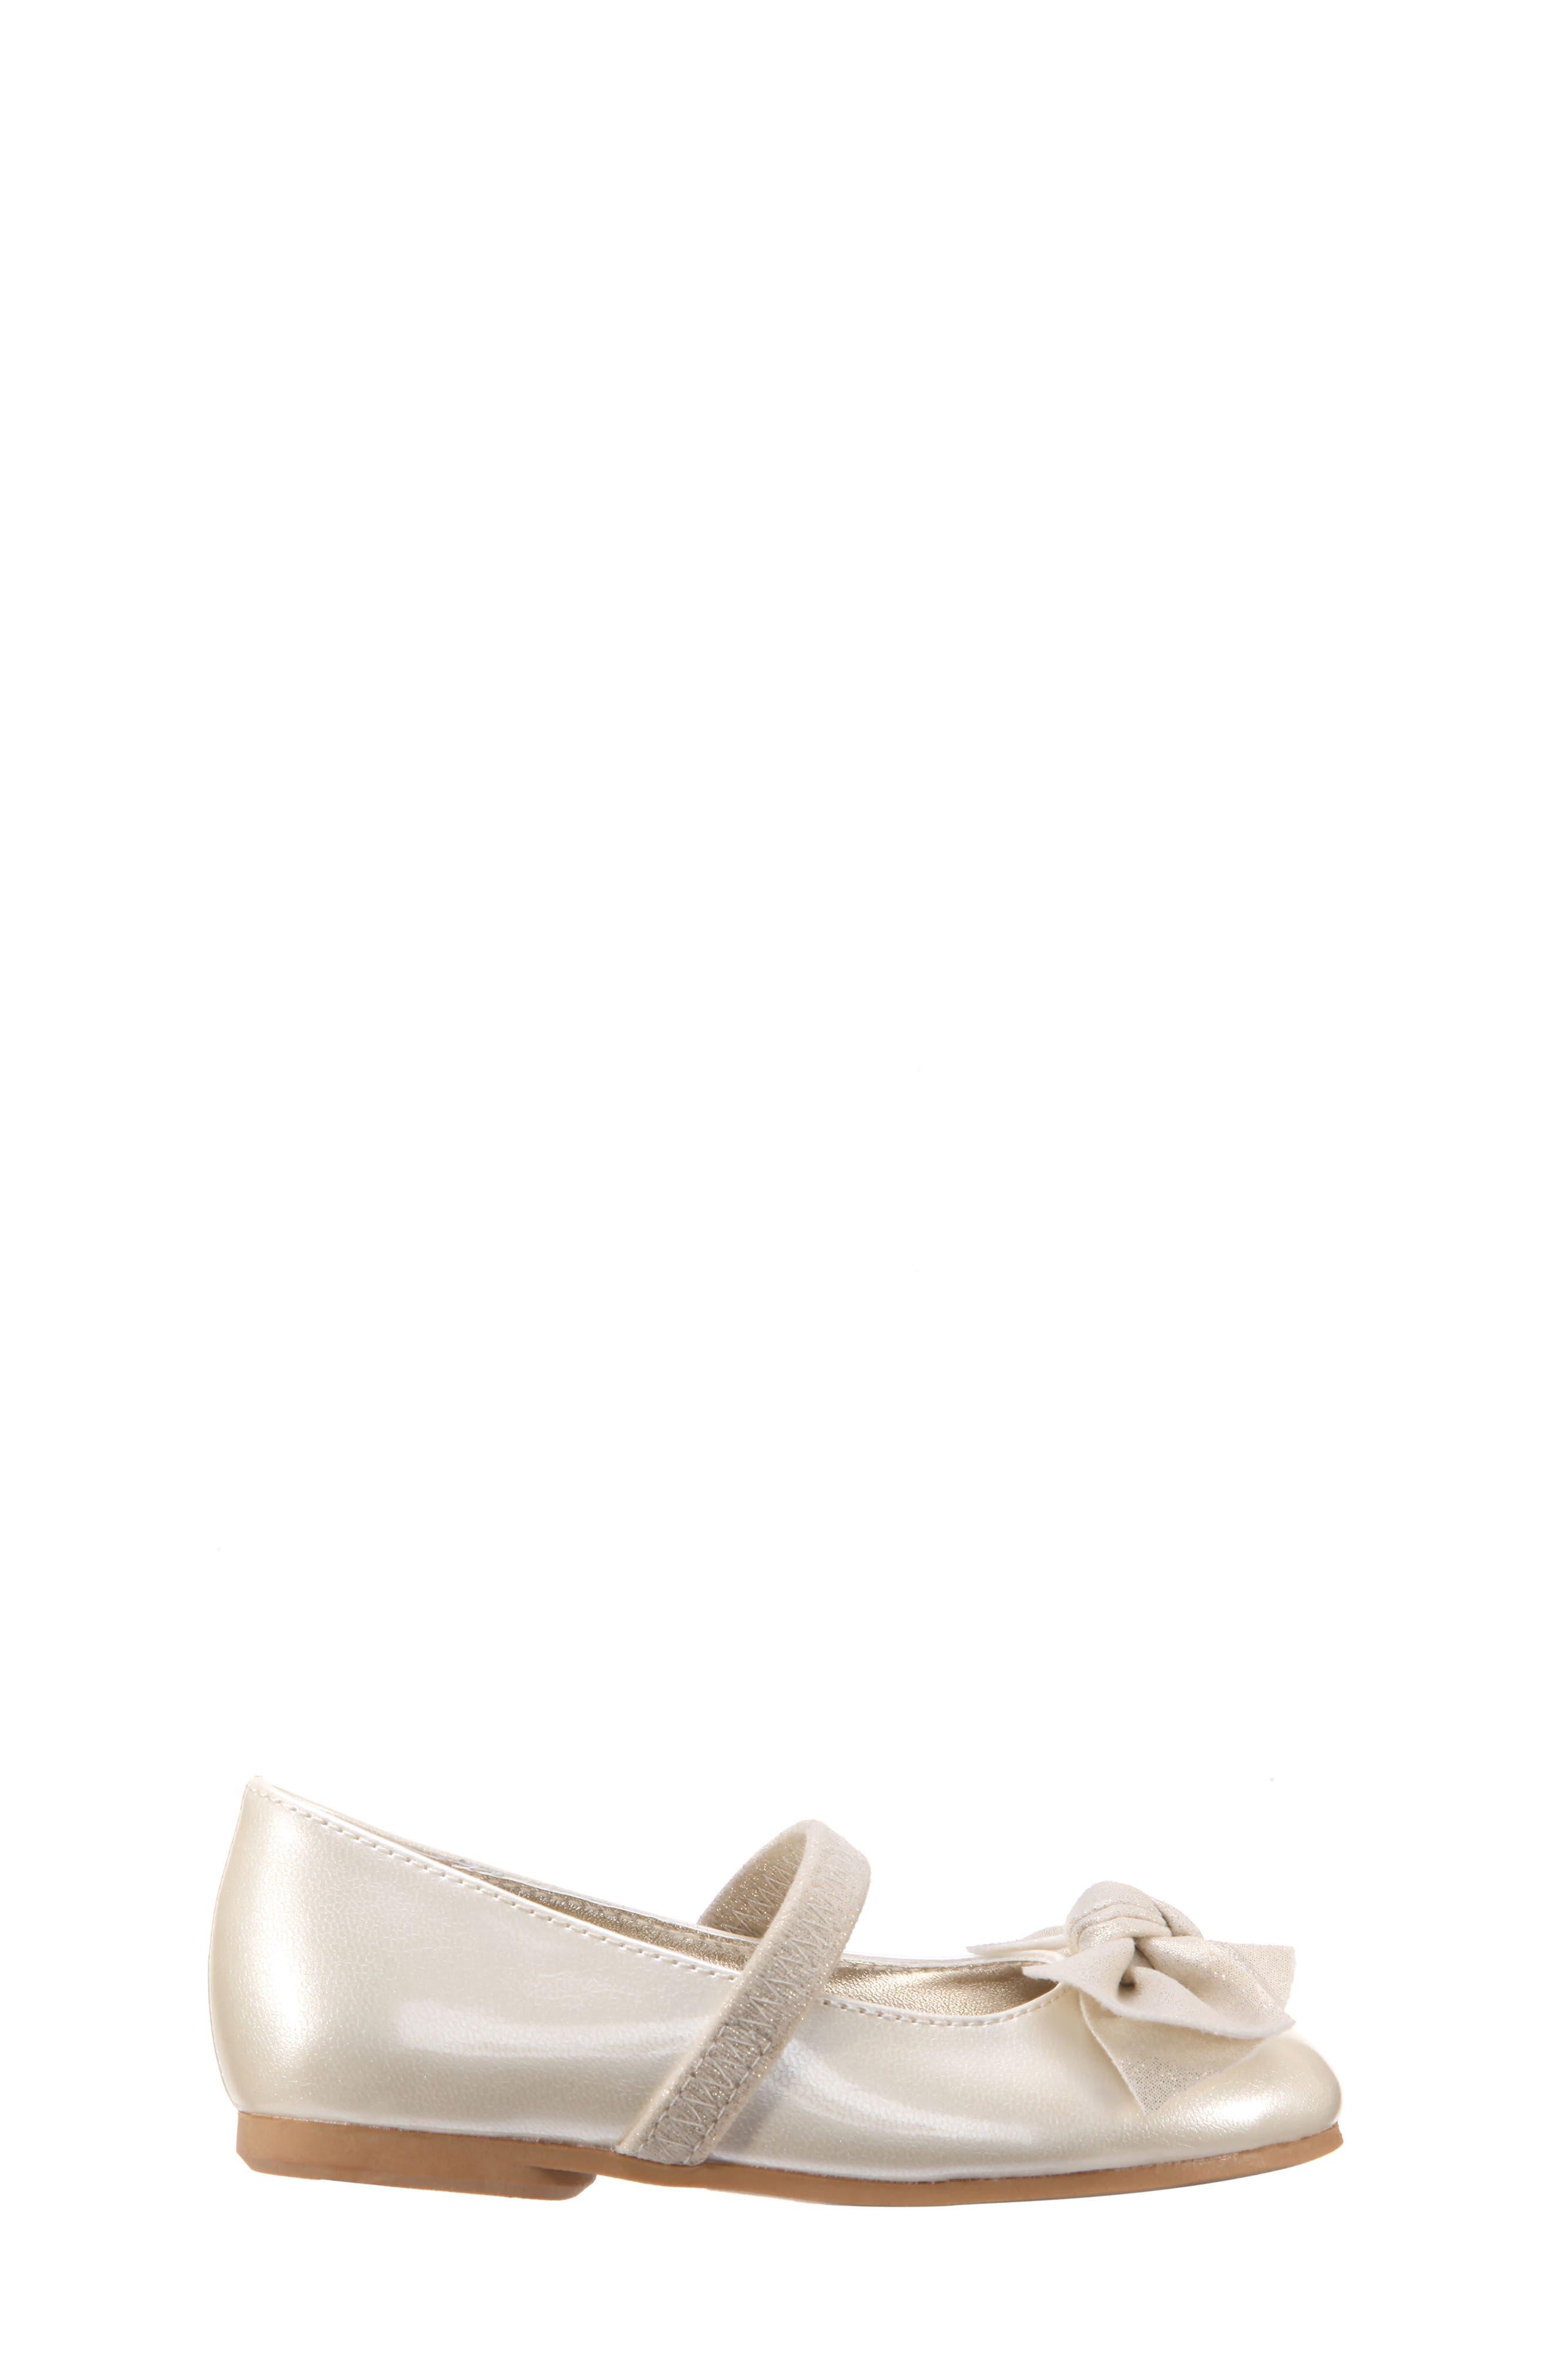 Kaytelyn-T Glitter Bow Ballet Flat,                             Alternate thumbnail 21, color,